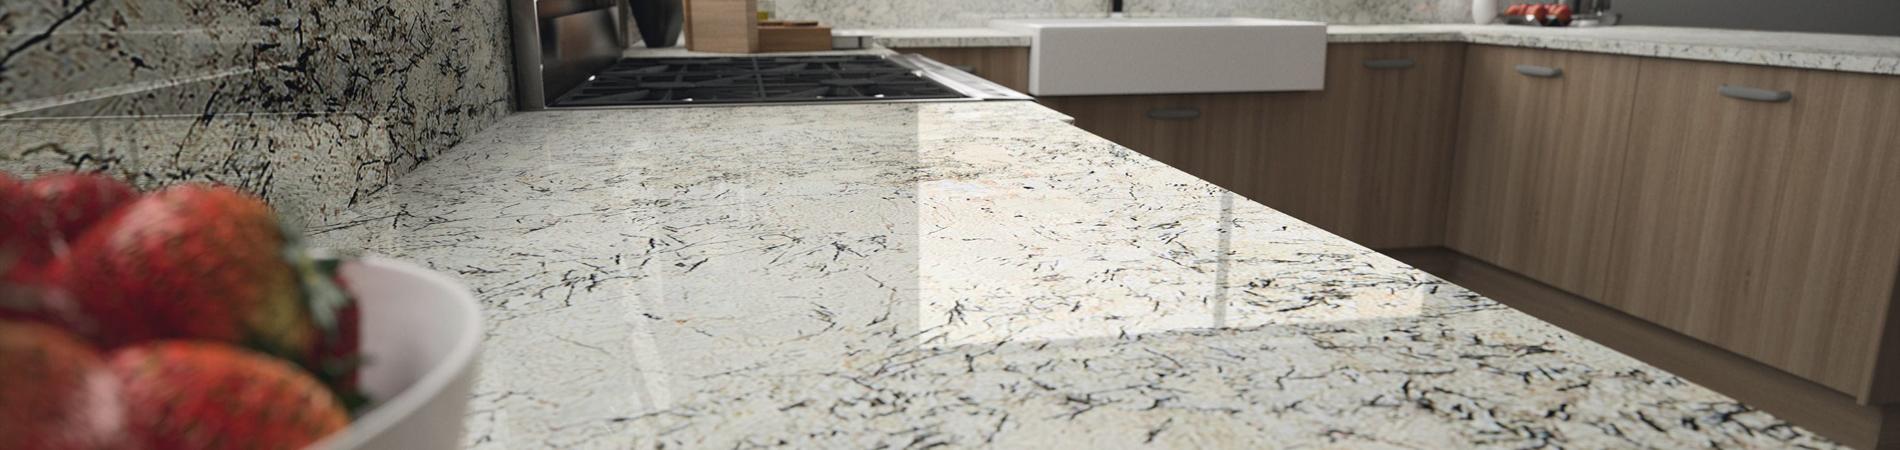 Granit Tischplatten nach Maß